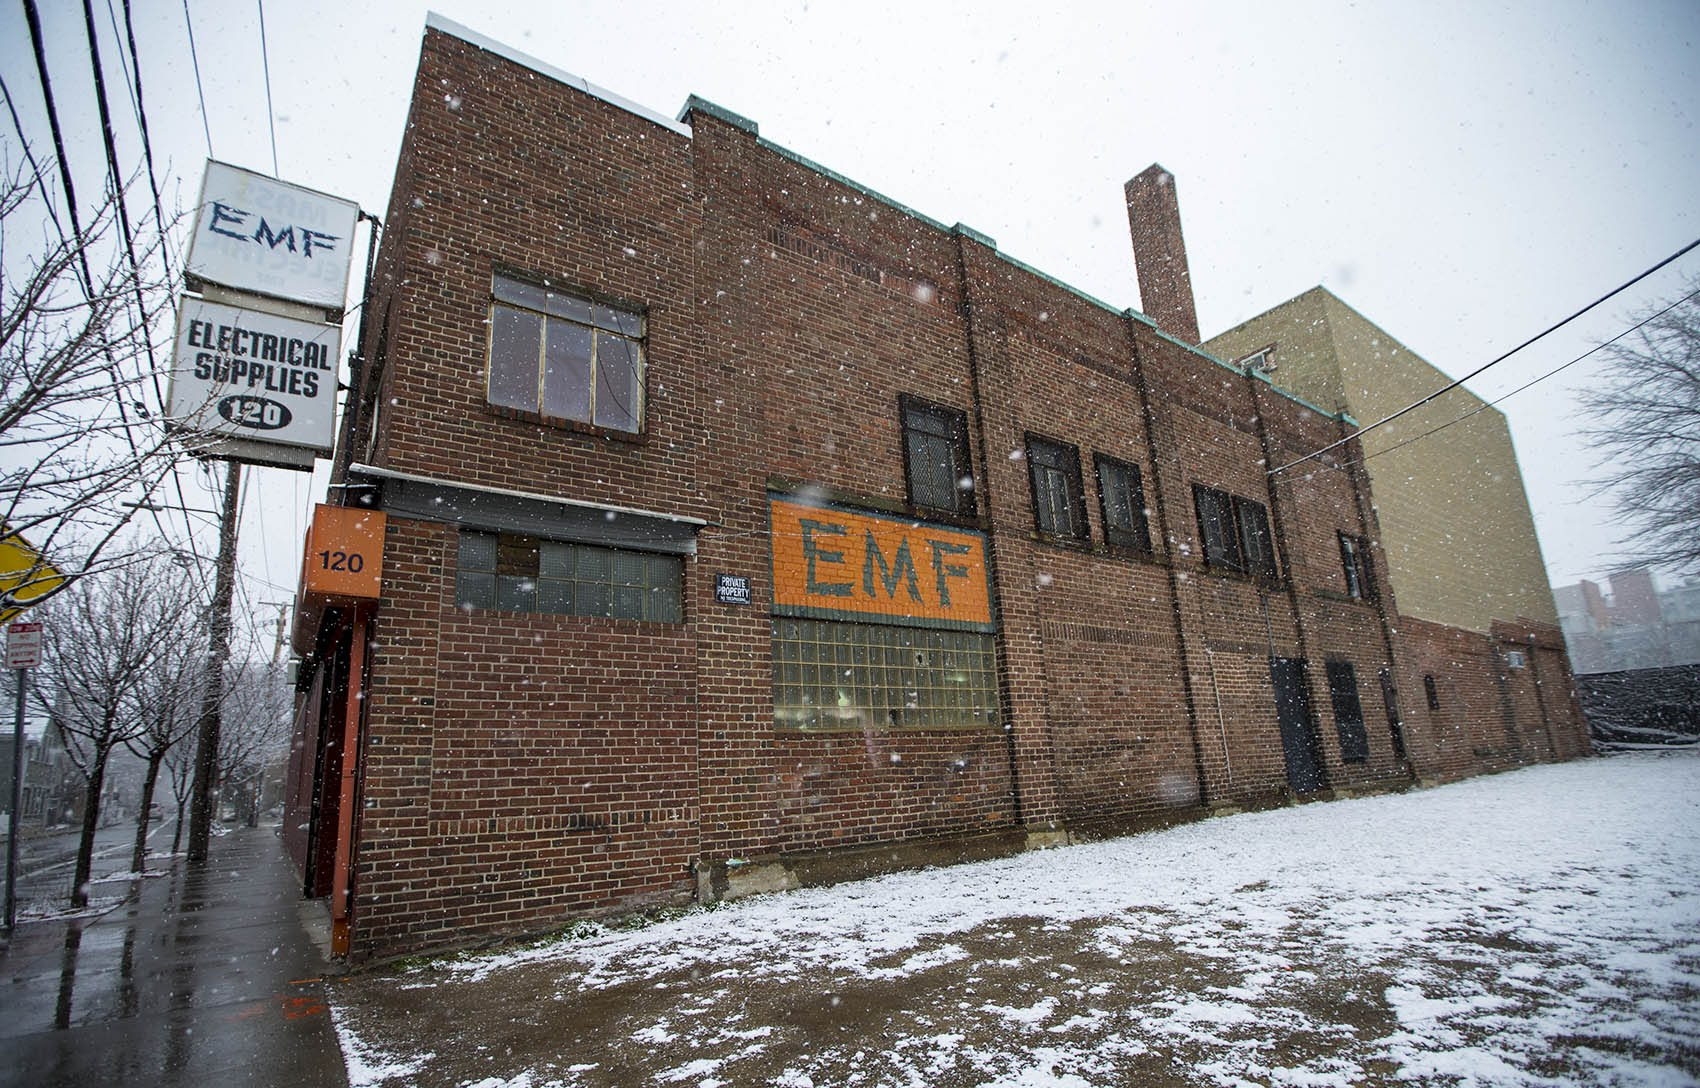 The EMF building on Brookline Street in Cambridge. (Jesse Costa/WBUR)